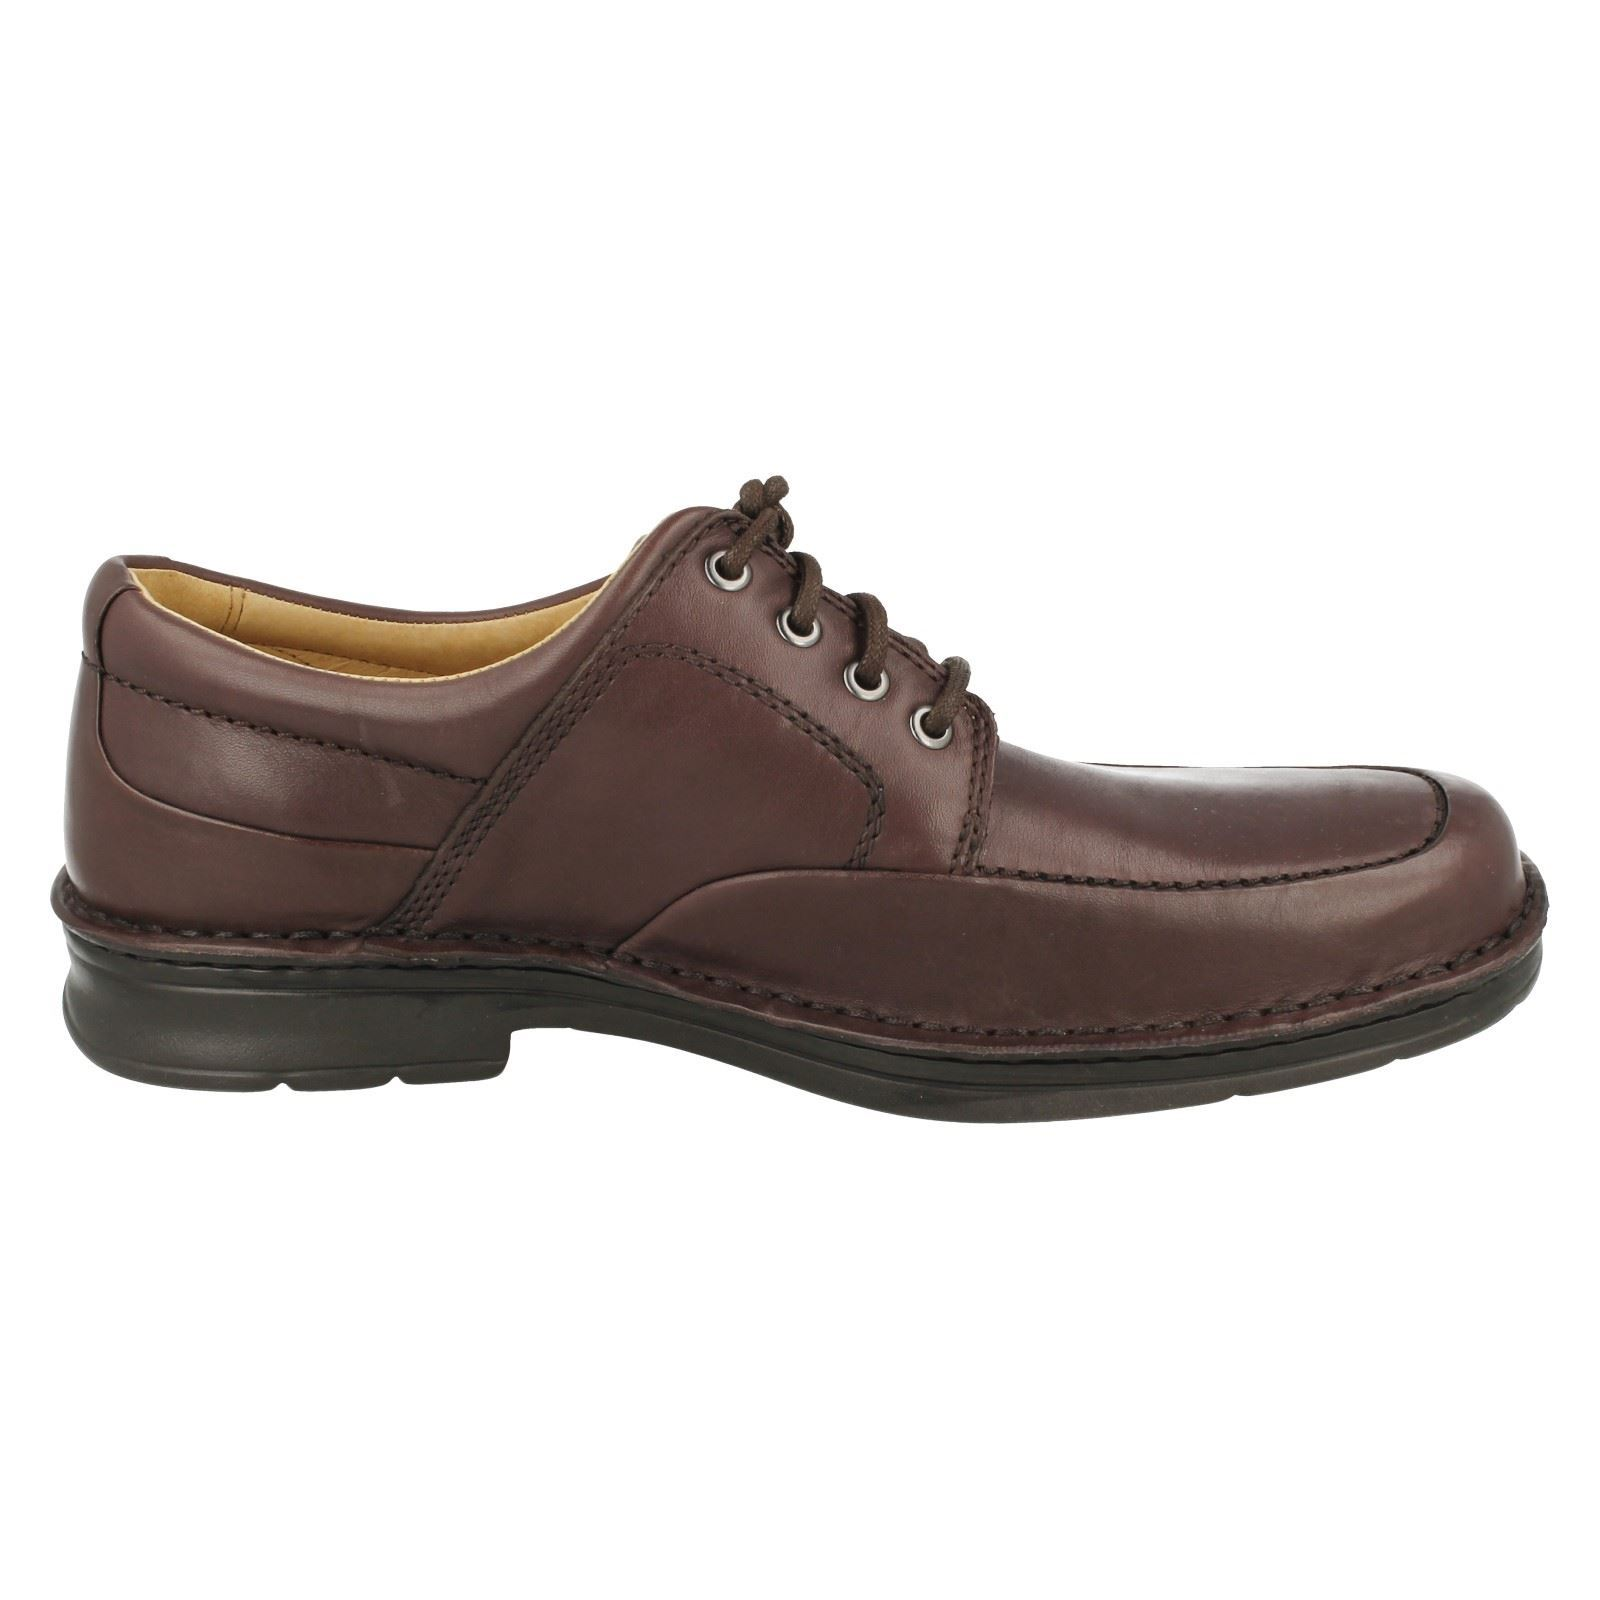 Hombres ébano Clarks de Run' Shoes 'saludo Lace Up marrón qx1wqUZfH